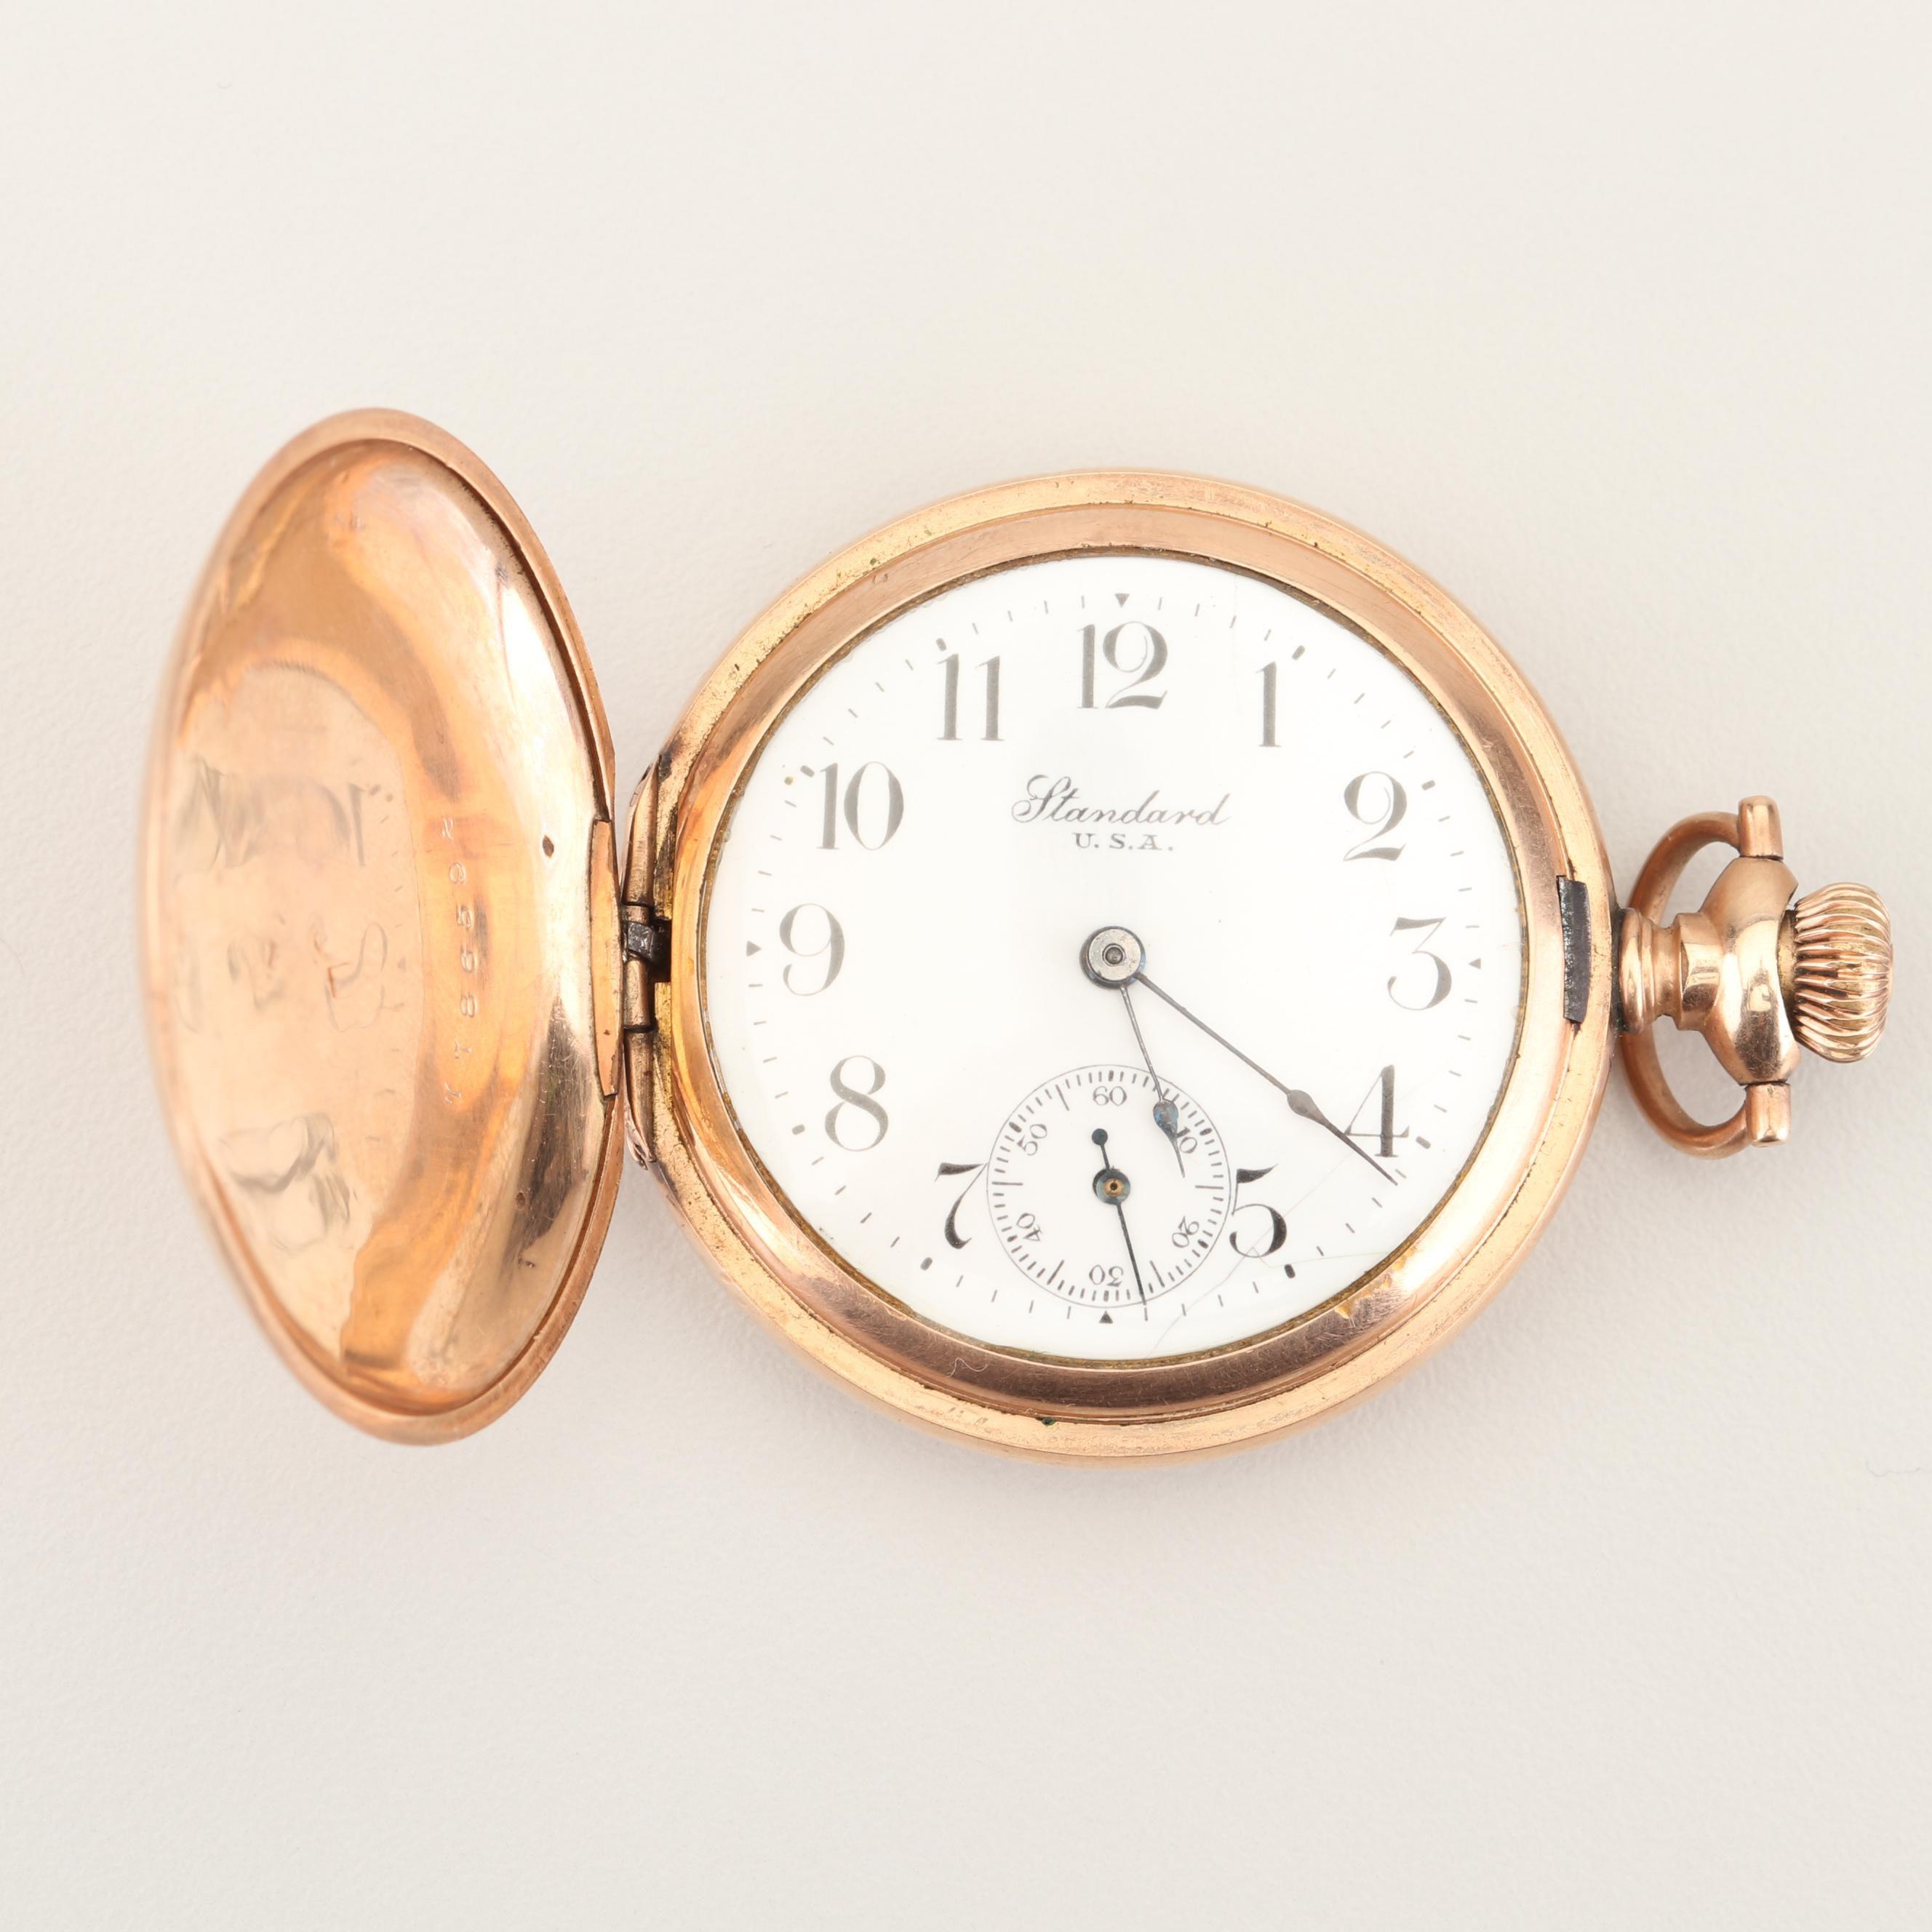 Antique Standard U.S.A. Gold Filled Pocket Watch